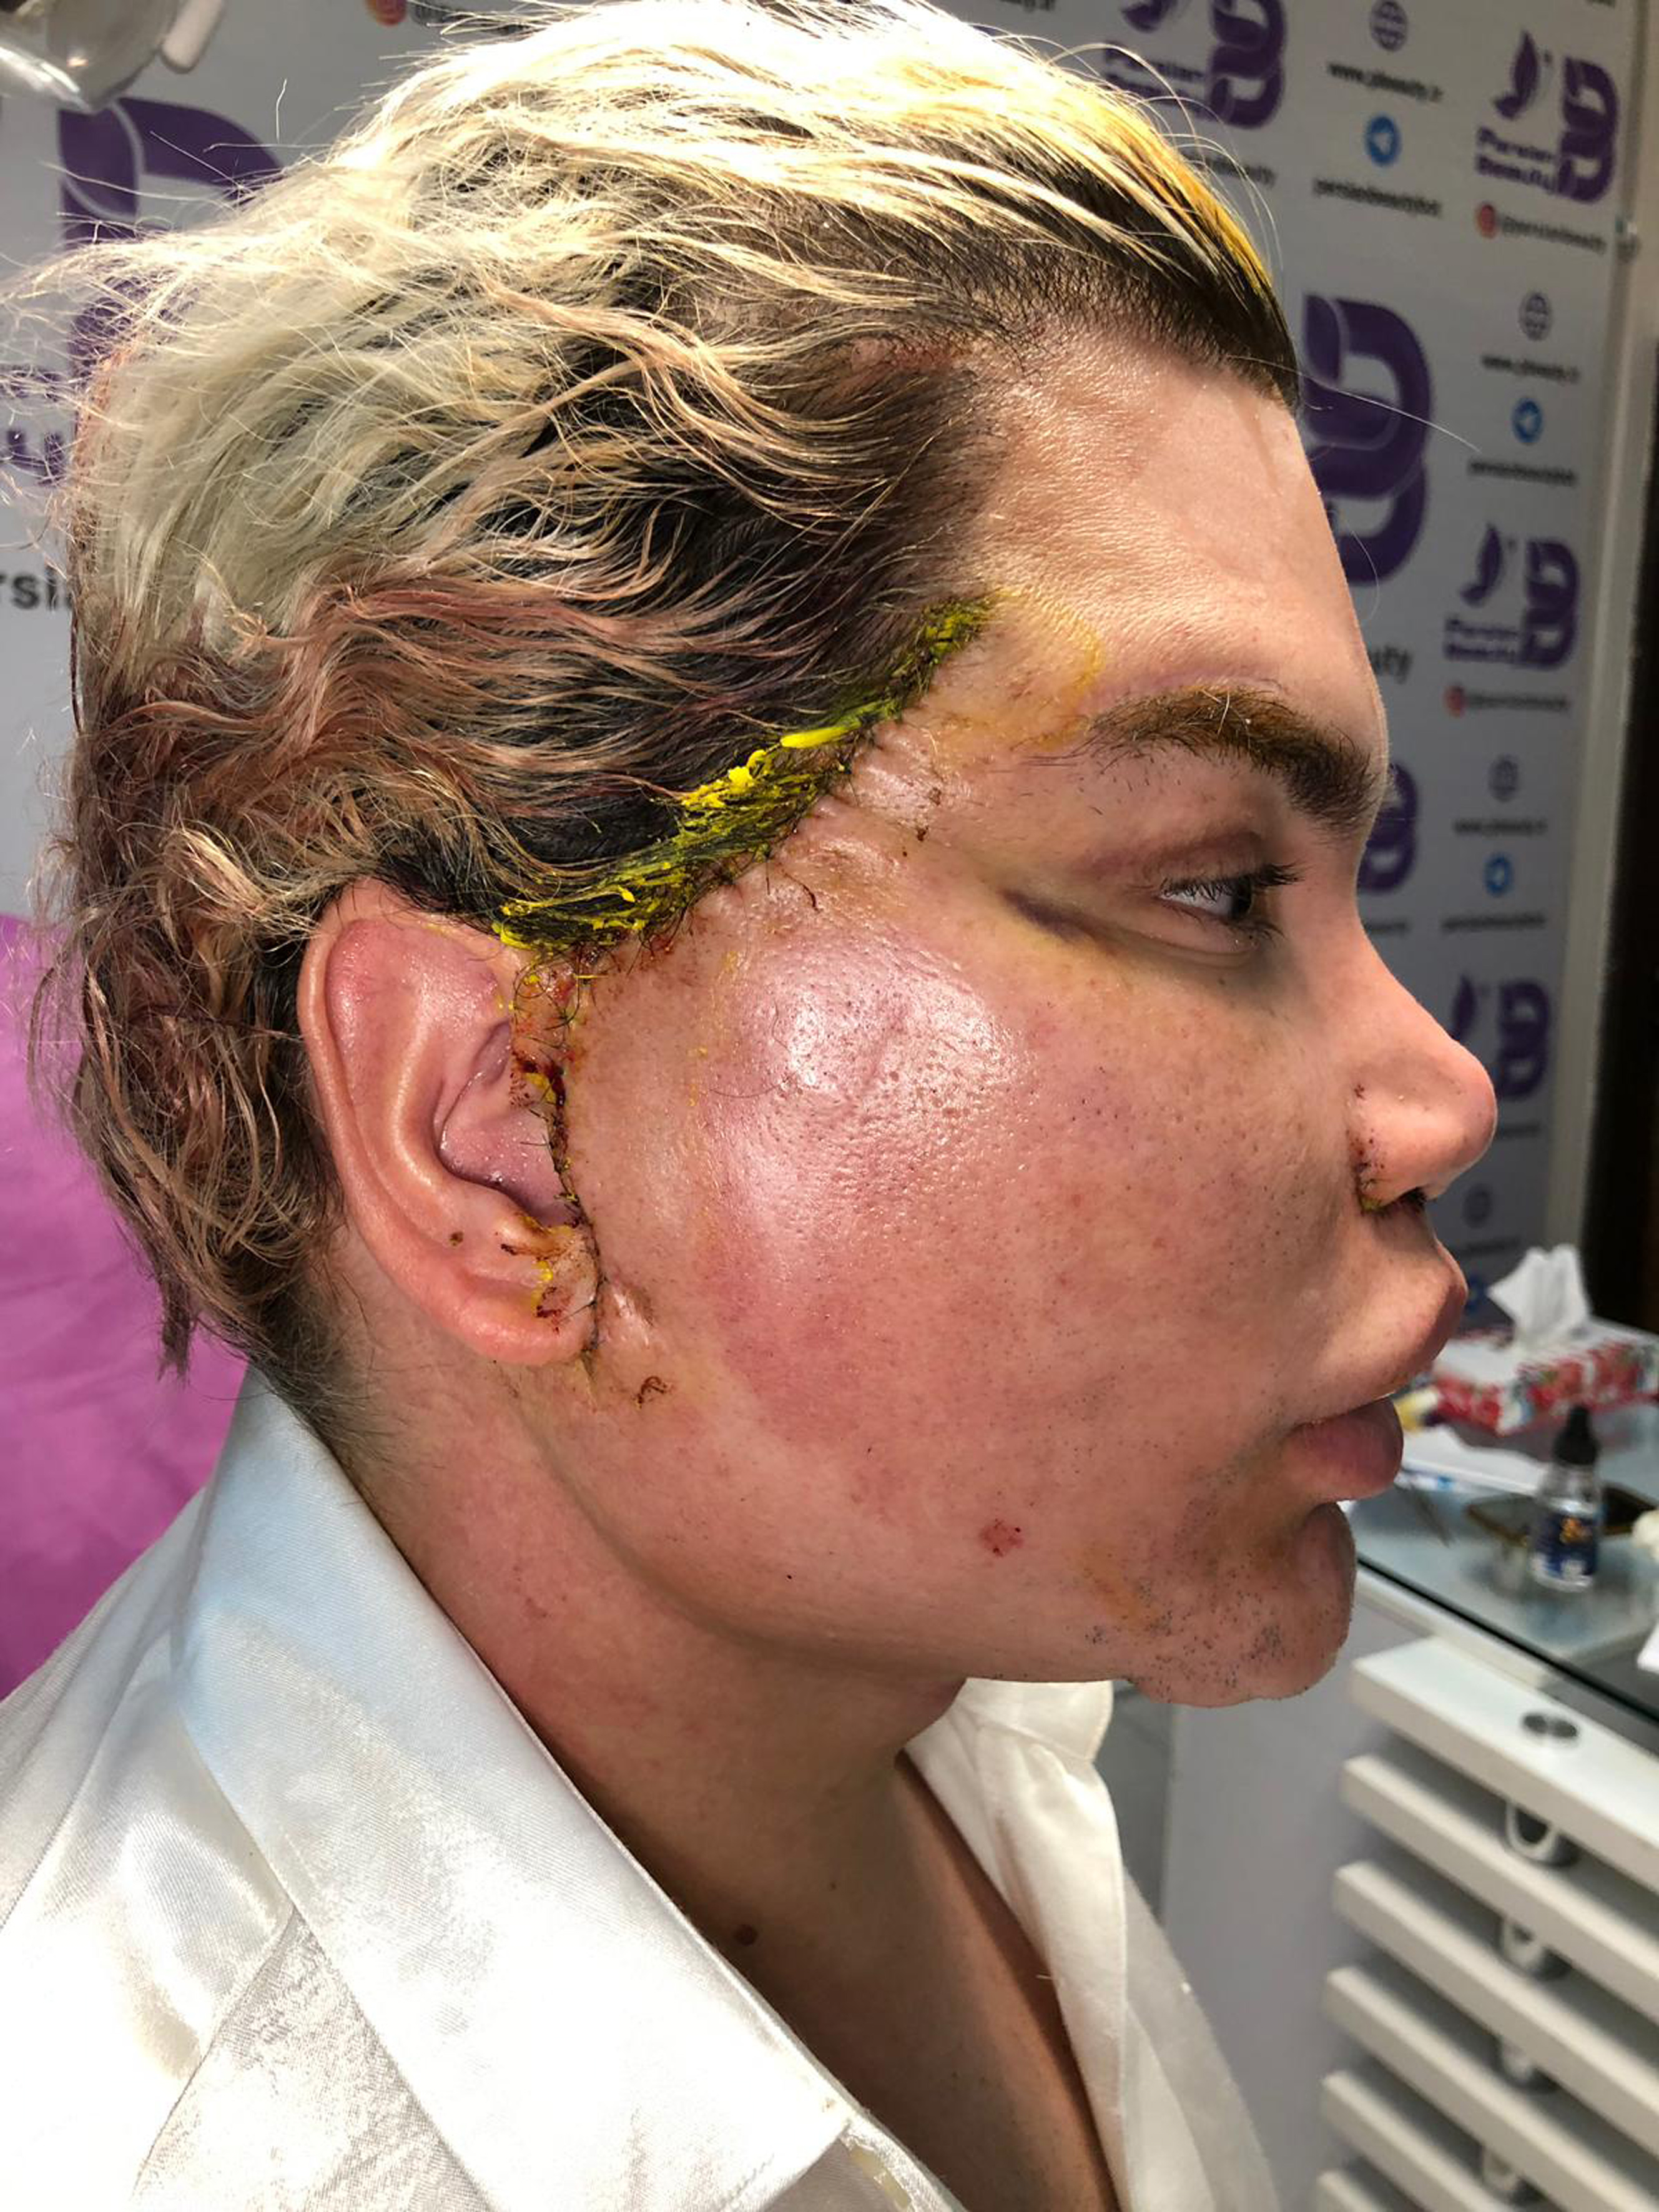 Human Ken Doll Rodrigo Alves Warns People About Facial